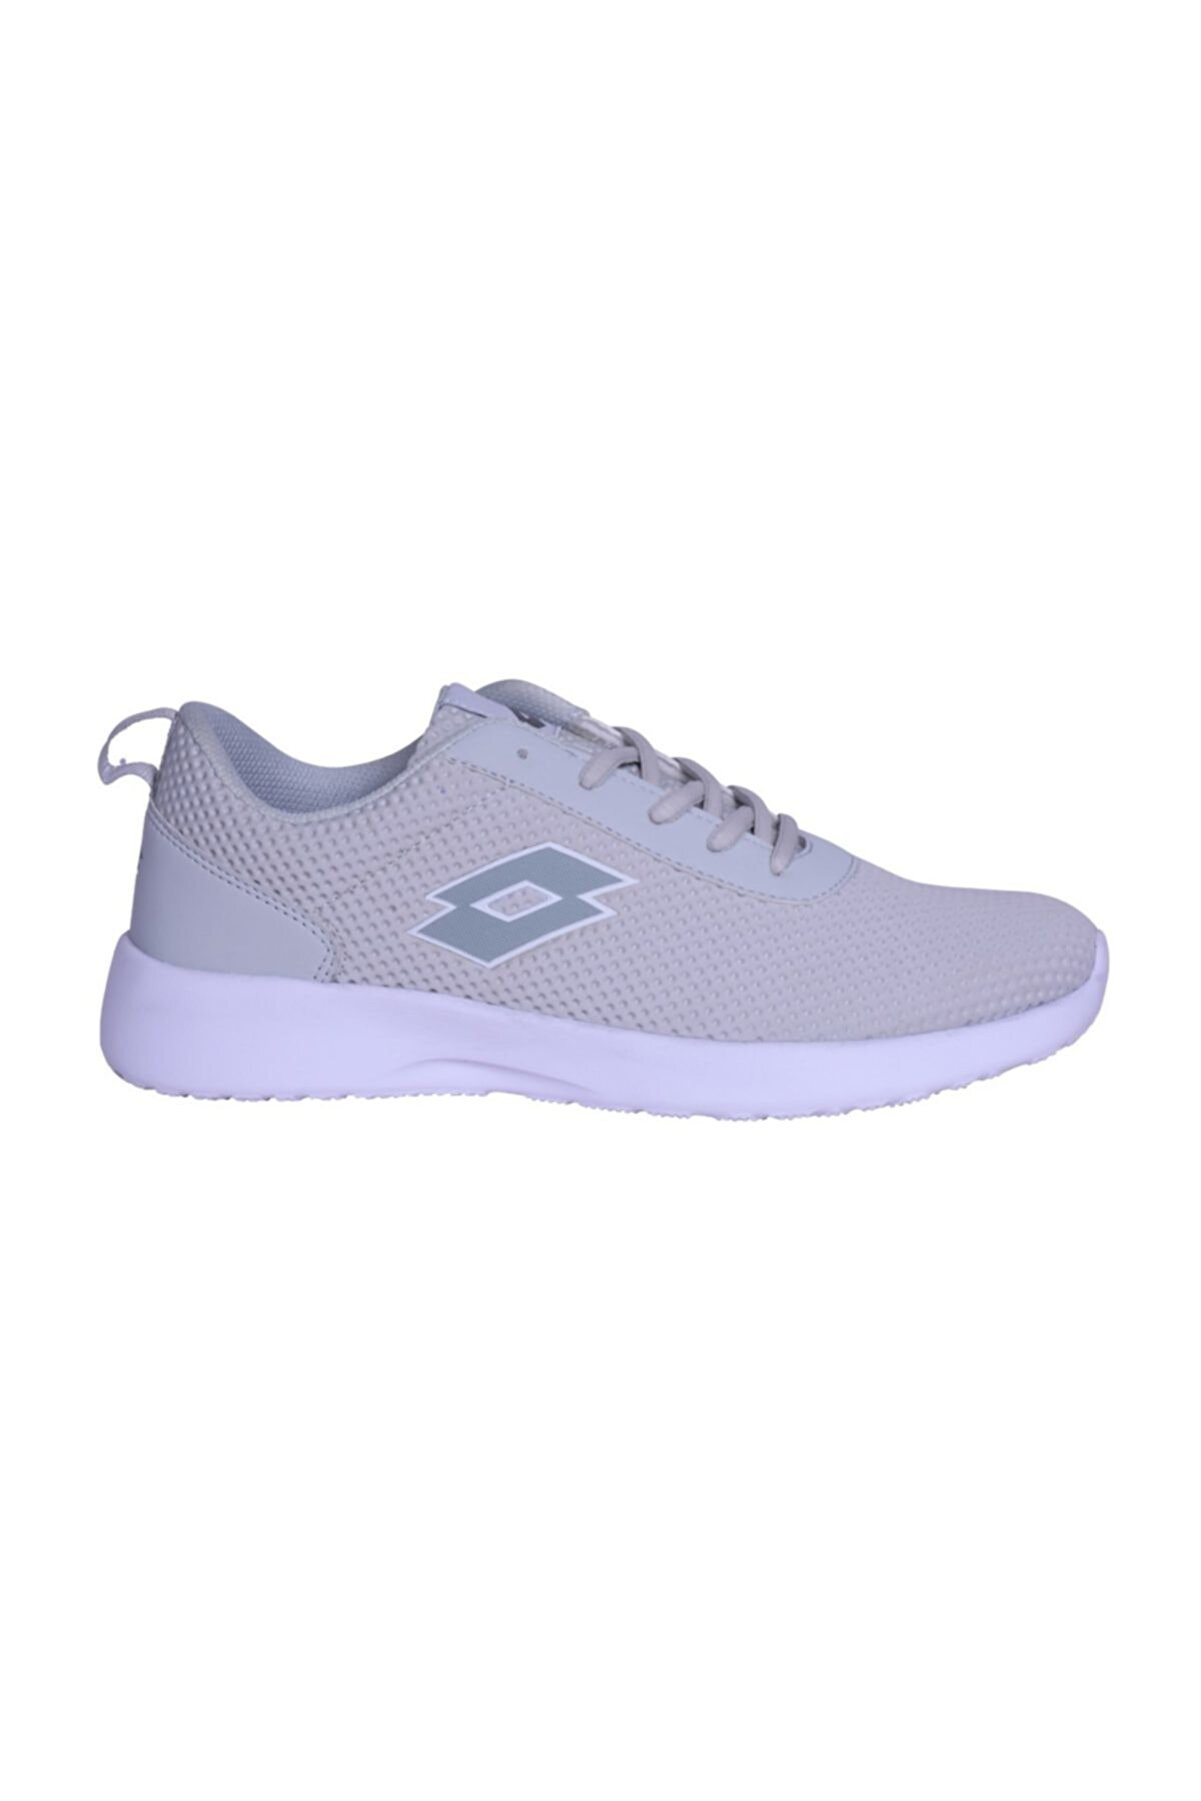 Lotto Sneaker Günlük Gri Erkek - T1333